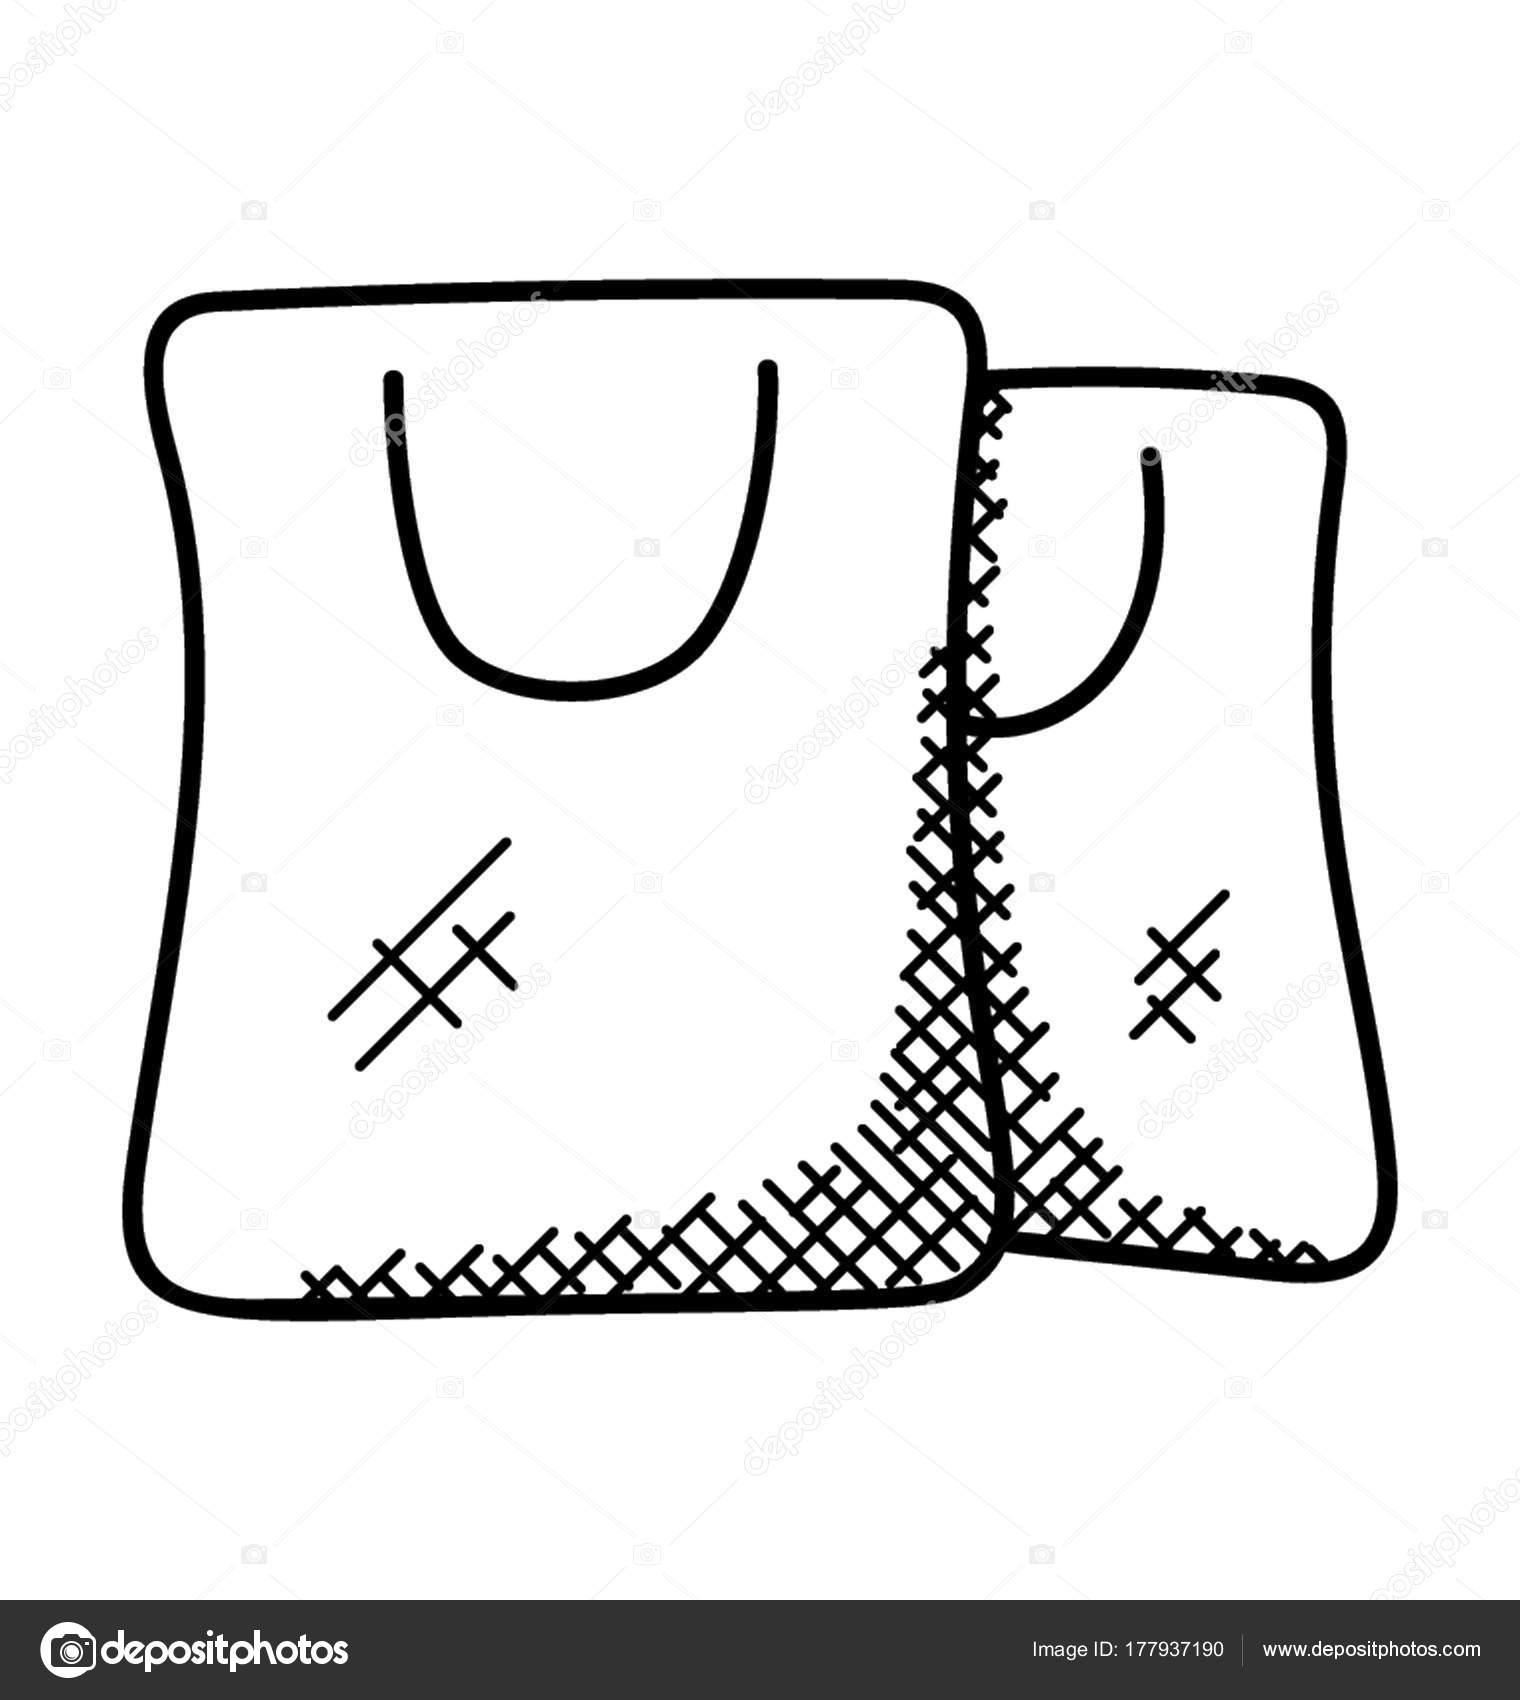 Compras Bolsas Icono Mano Doodle Dibujos q76w46R